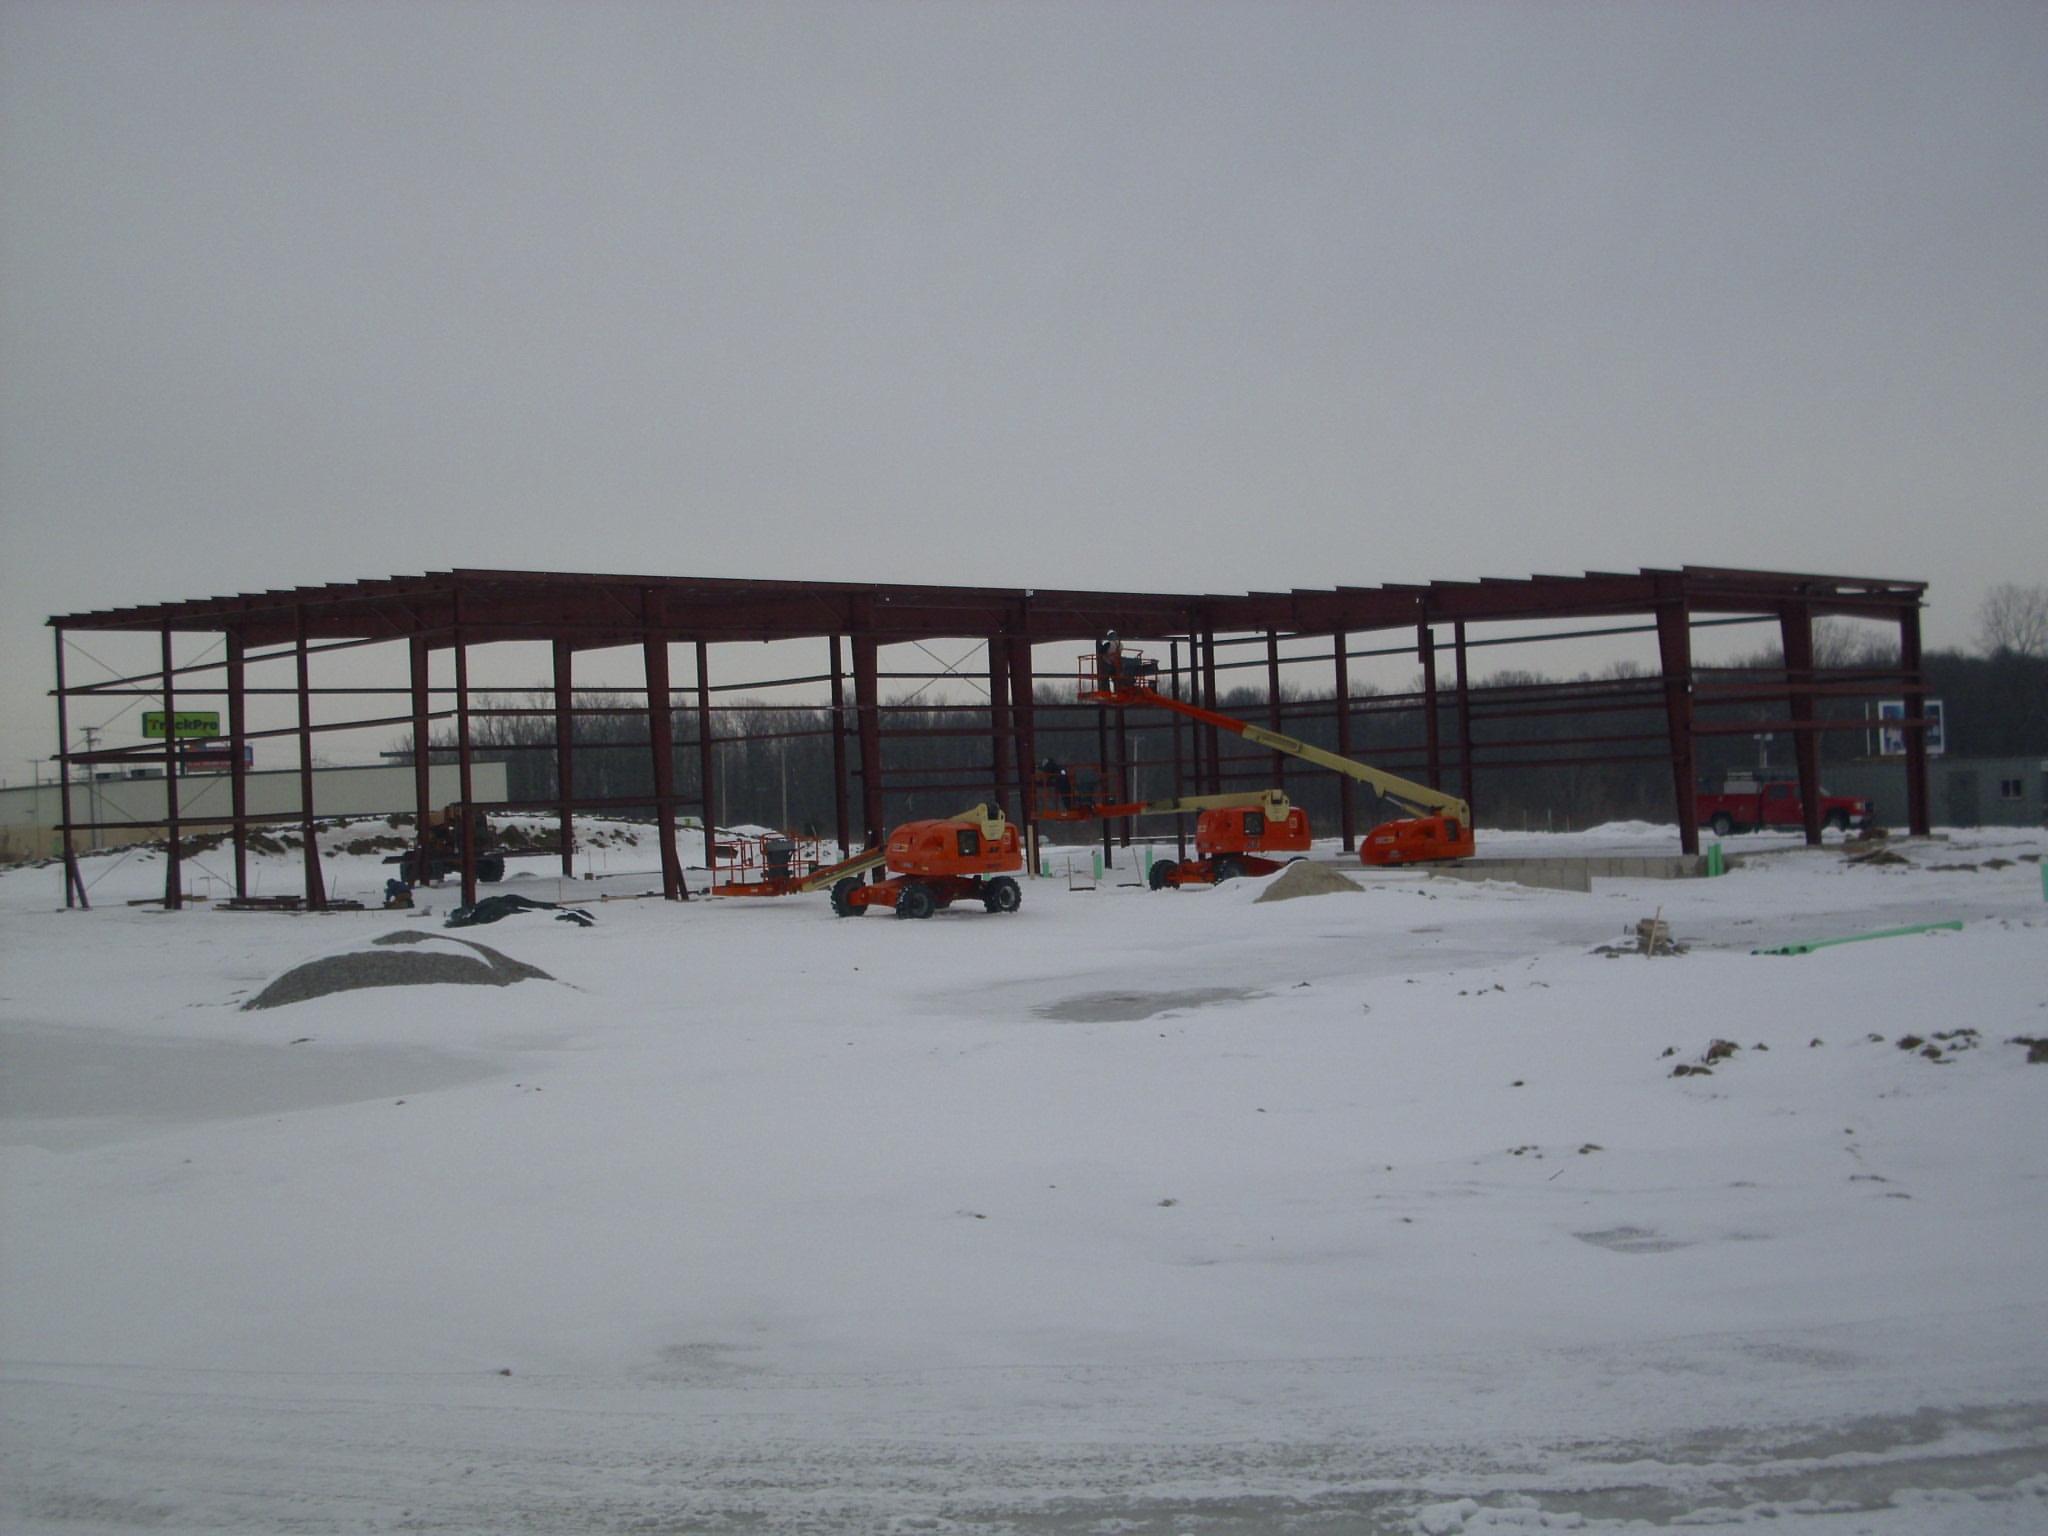 EVAPAR FT. Wayne construction